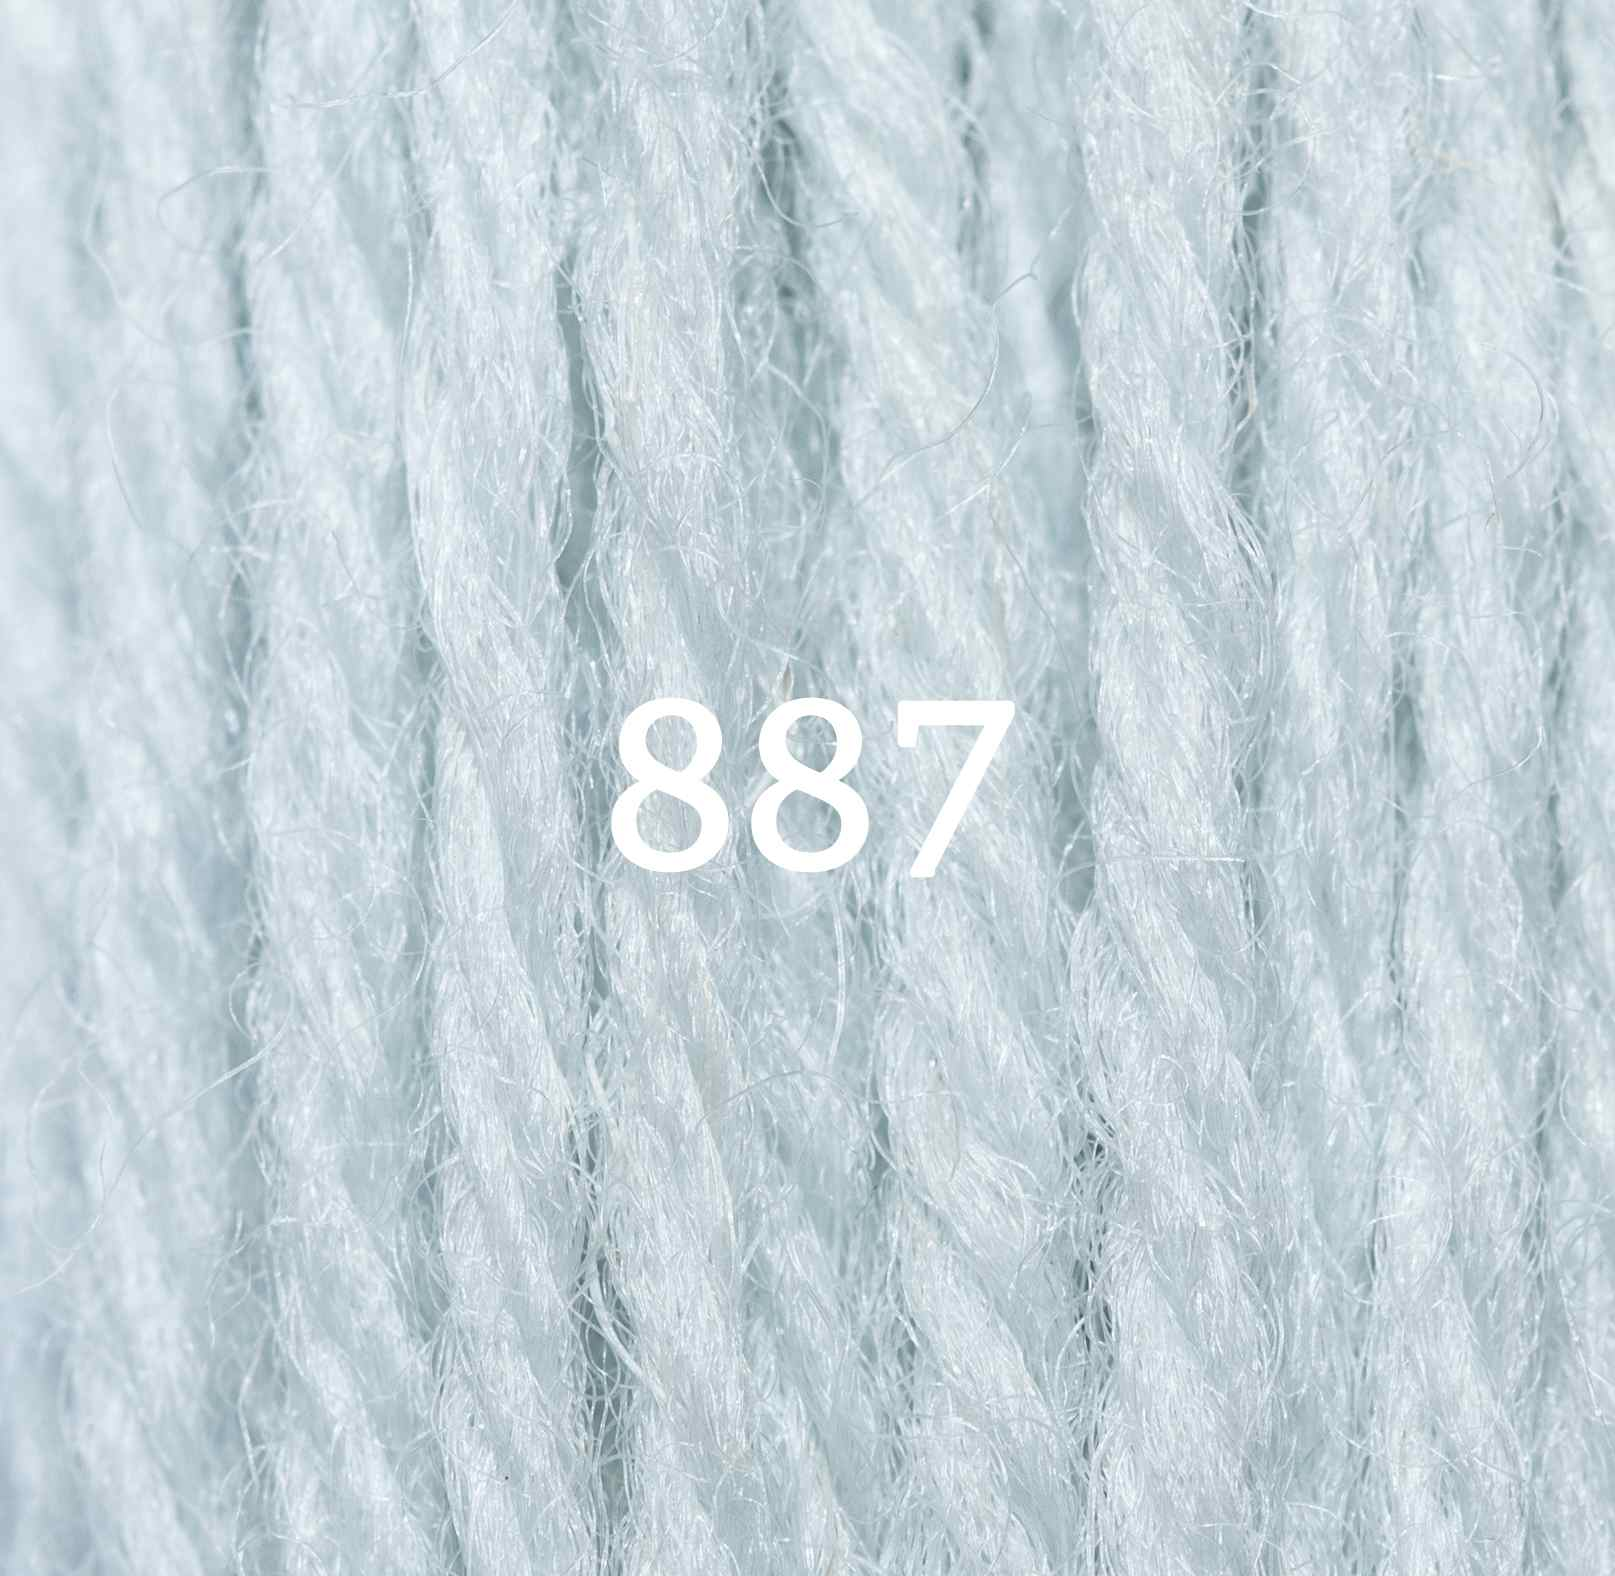 Pastel-Shades-2-887